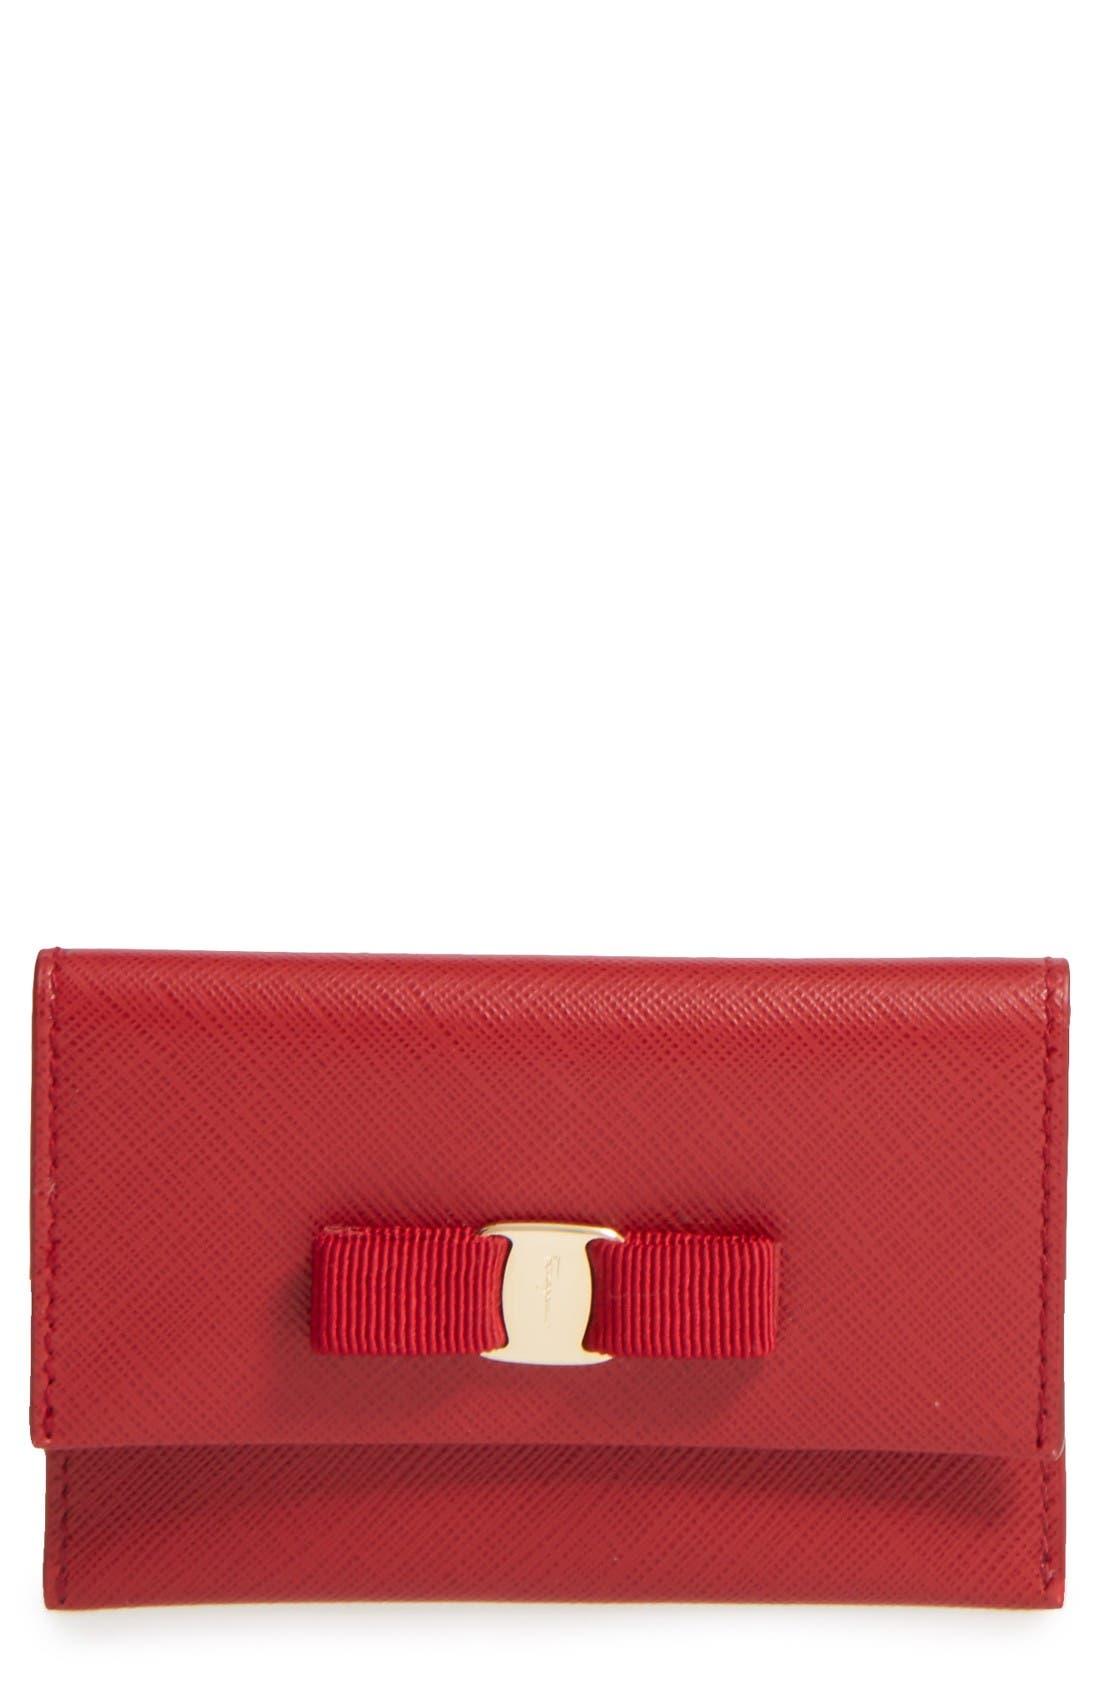 Alternate Image 1 Selected - Salvatore Ferragamo Vara Leather Card Case